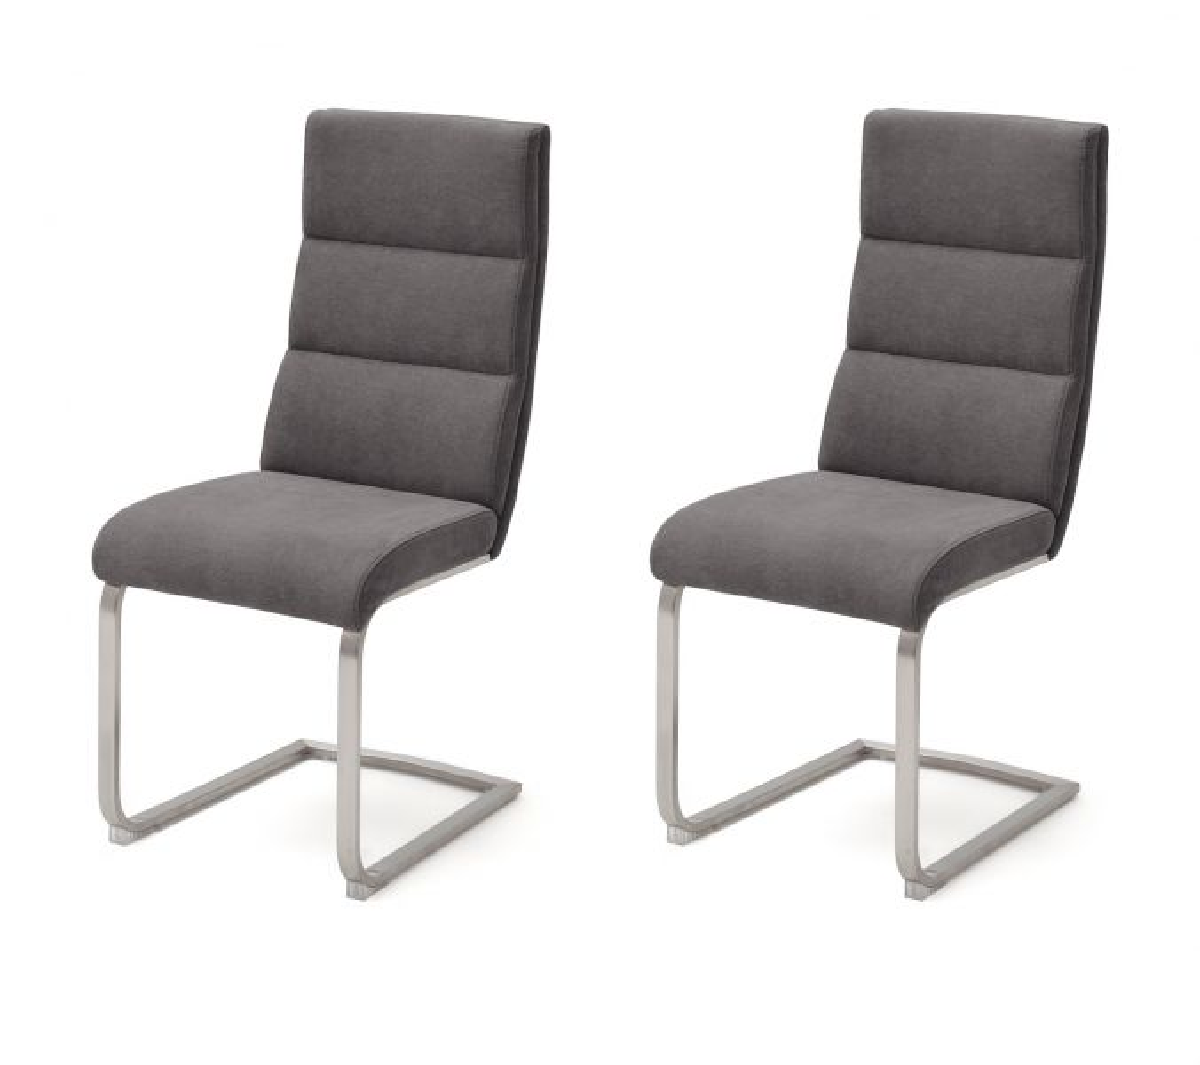 2 x Stuhl Giulia Anthrazit Schwinger